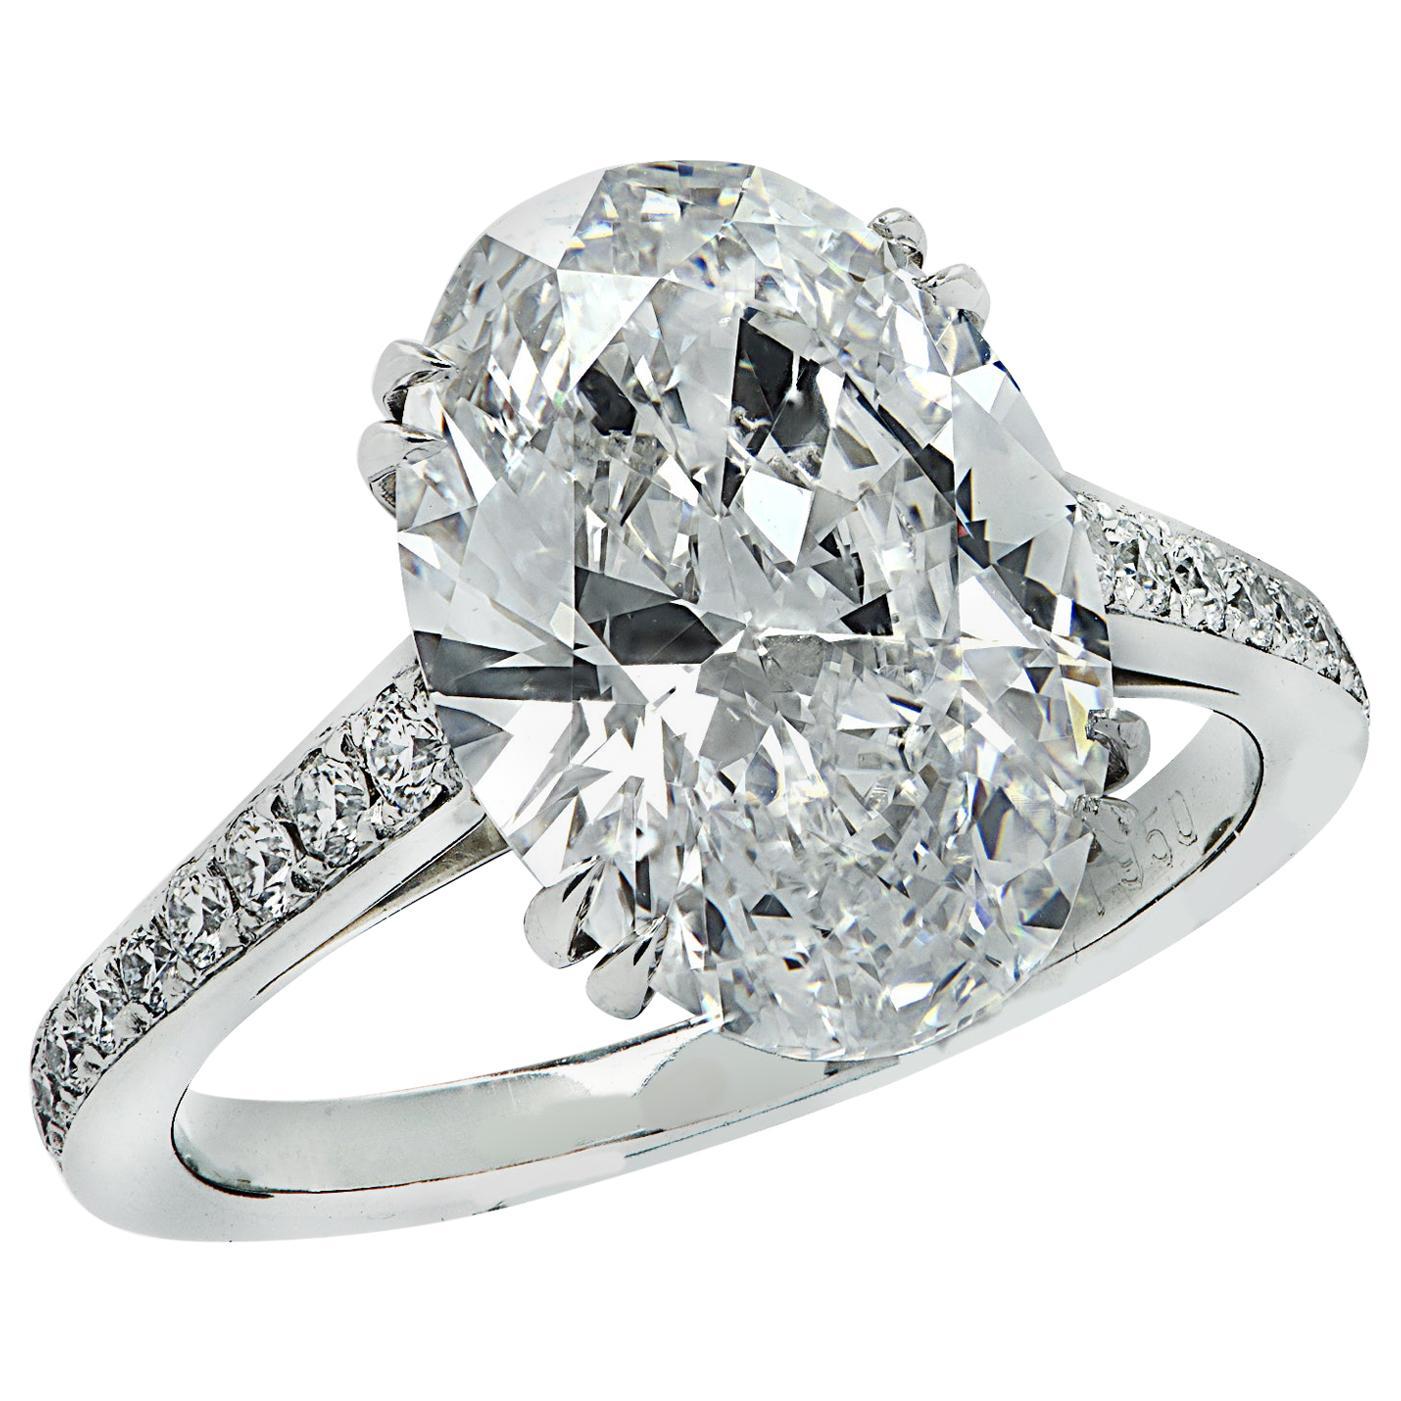 Vivid Diamonds GIA Certified 4.63 Carat Oval Diamond Engagement Ring